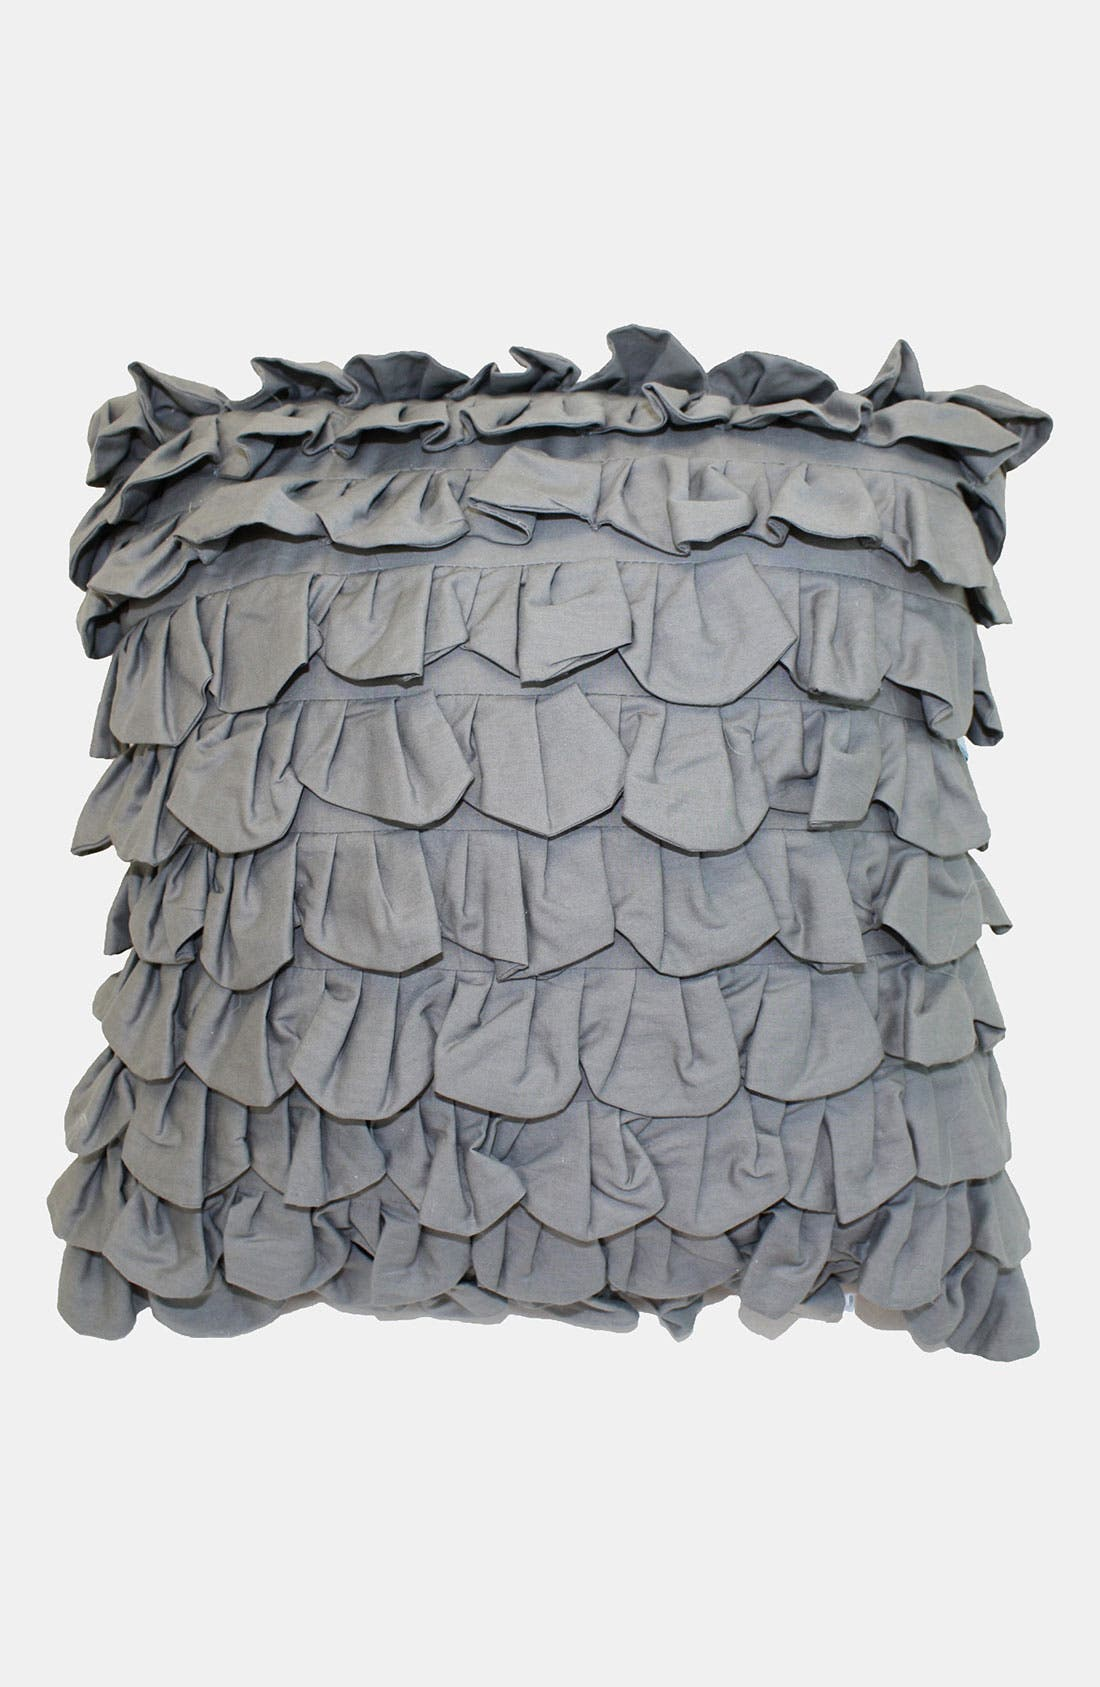 Alternate Image 1 Selected - Laundry by Shelli Segal 'Nanette' Ruffled Pillow